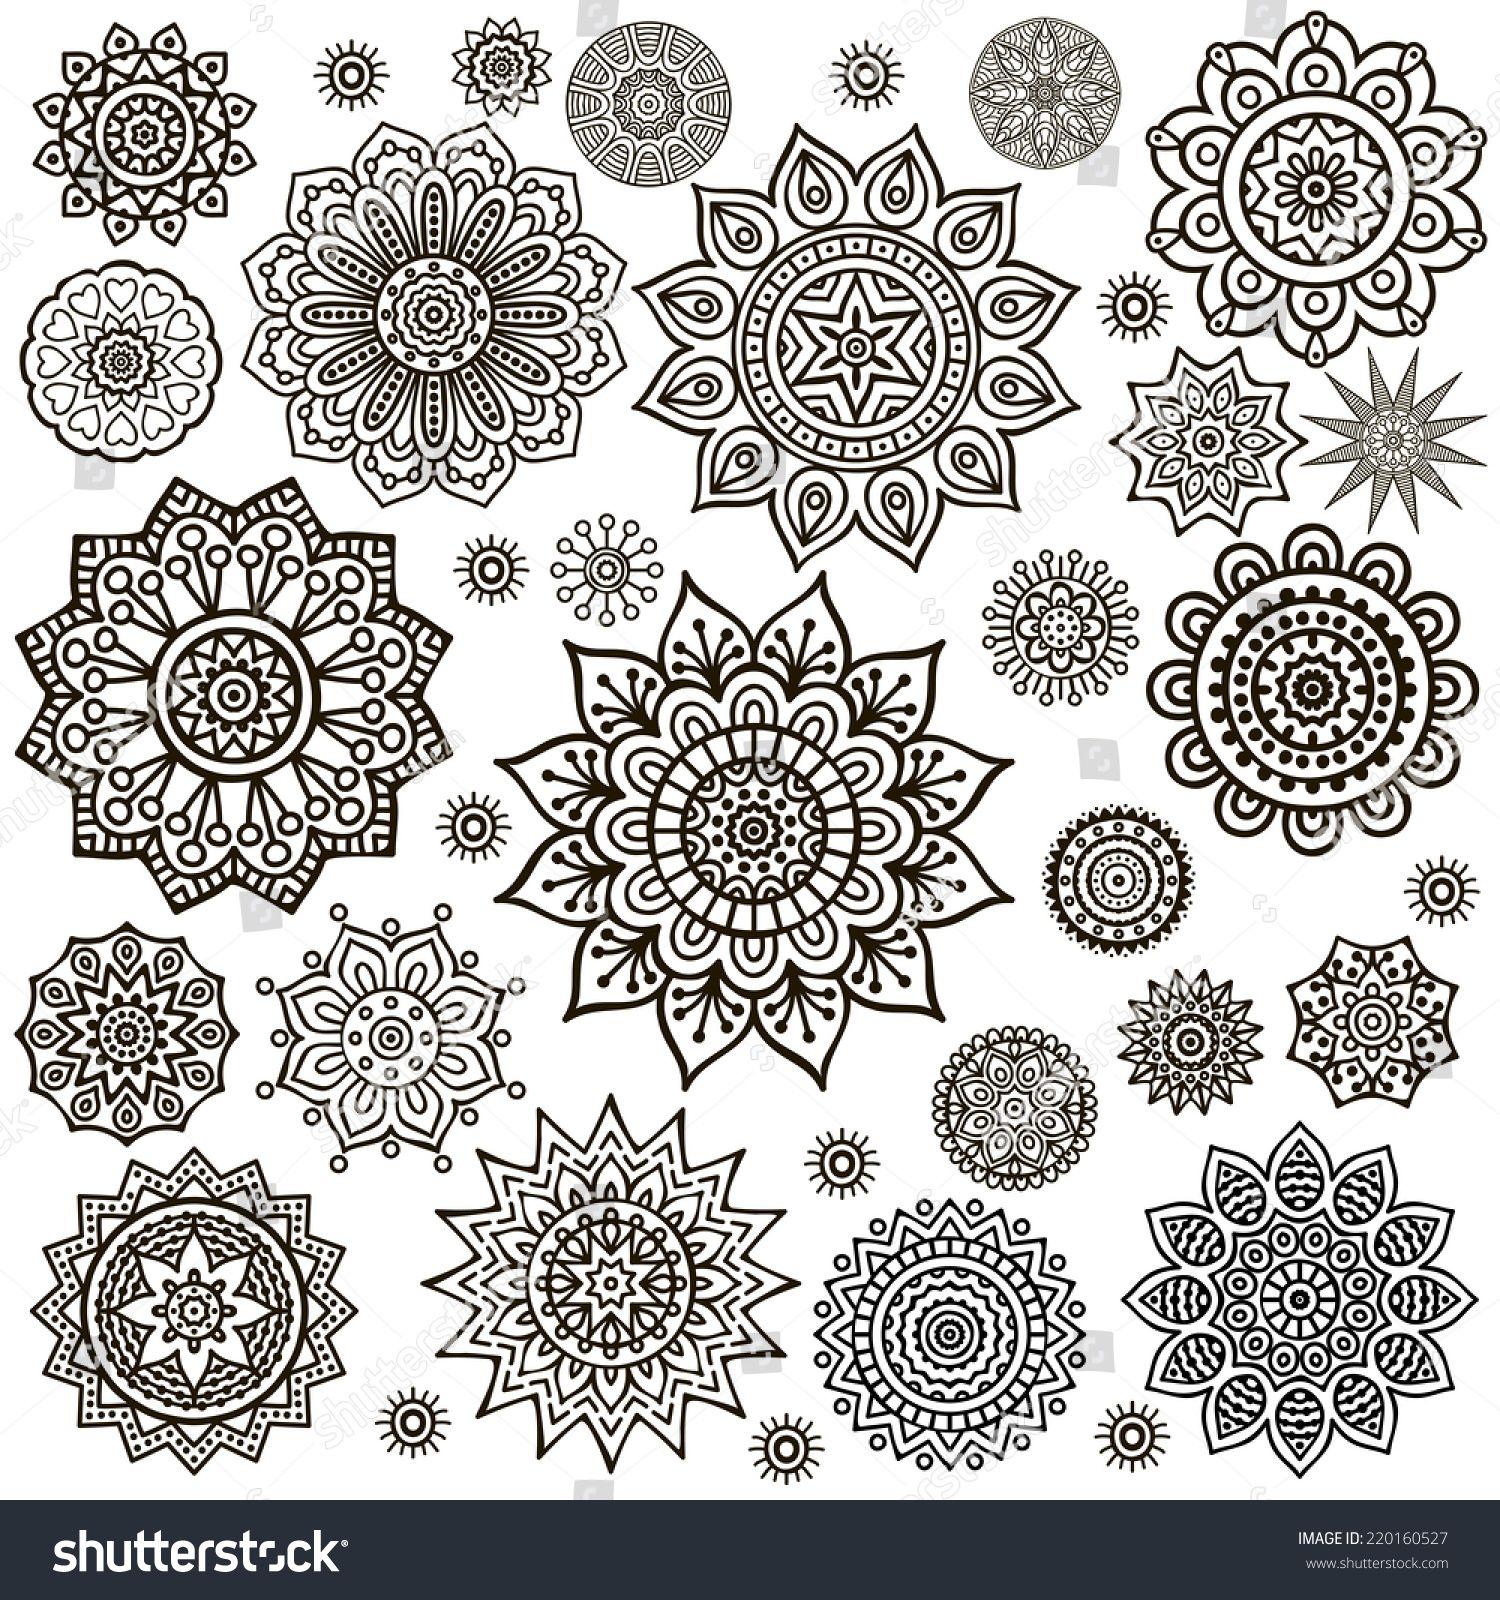 Mandala Round Ornament Pattern Vintage Decorative Elements Hand Drawn Background